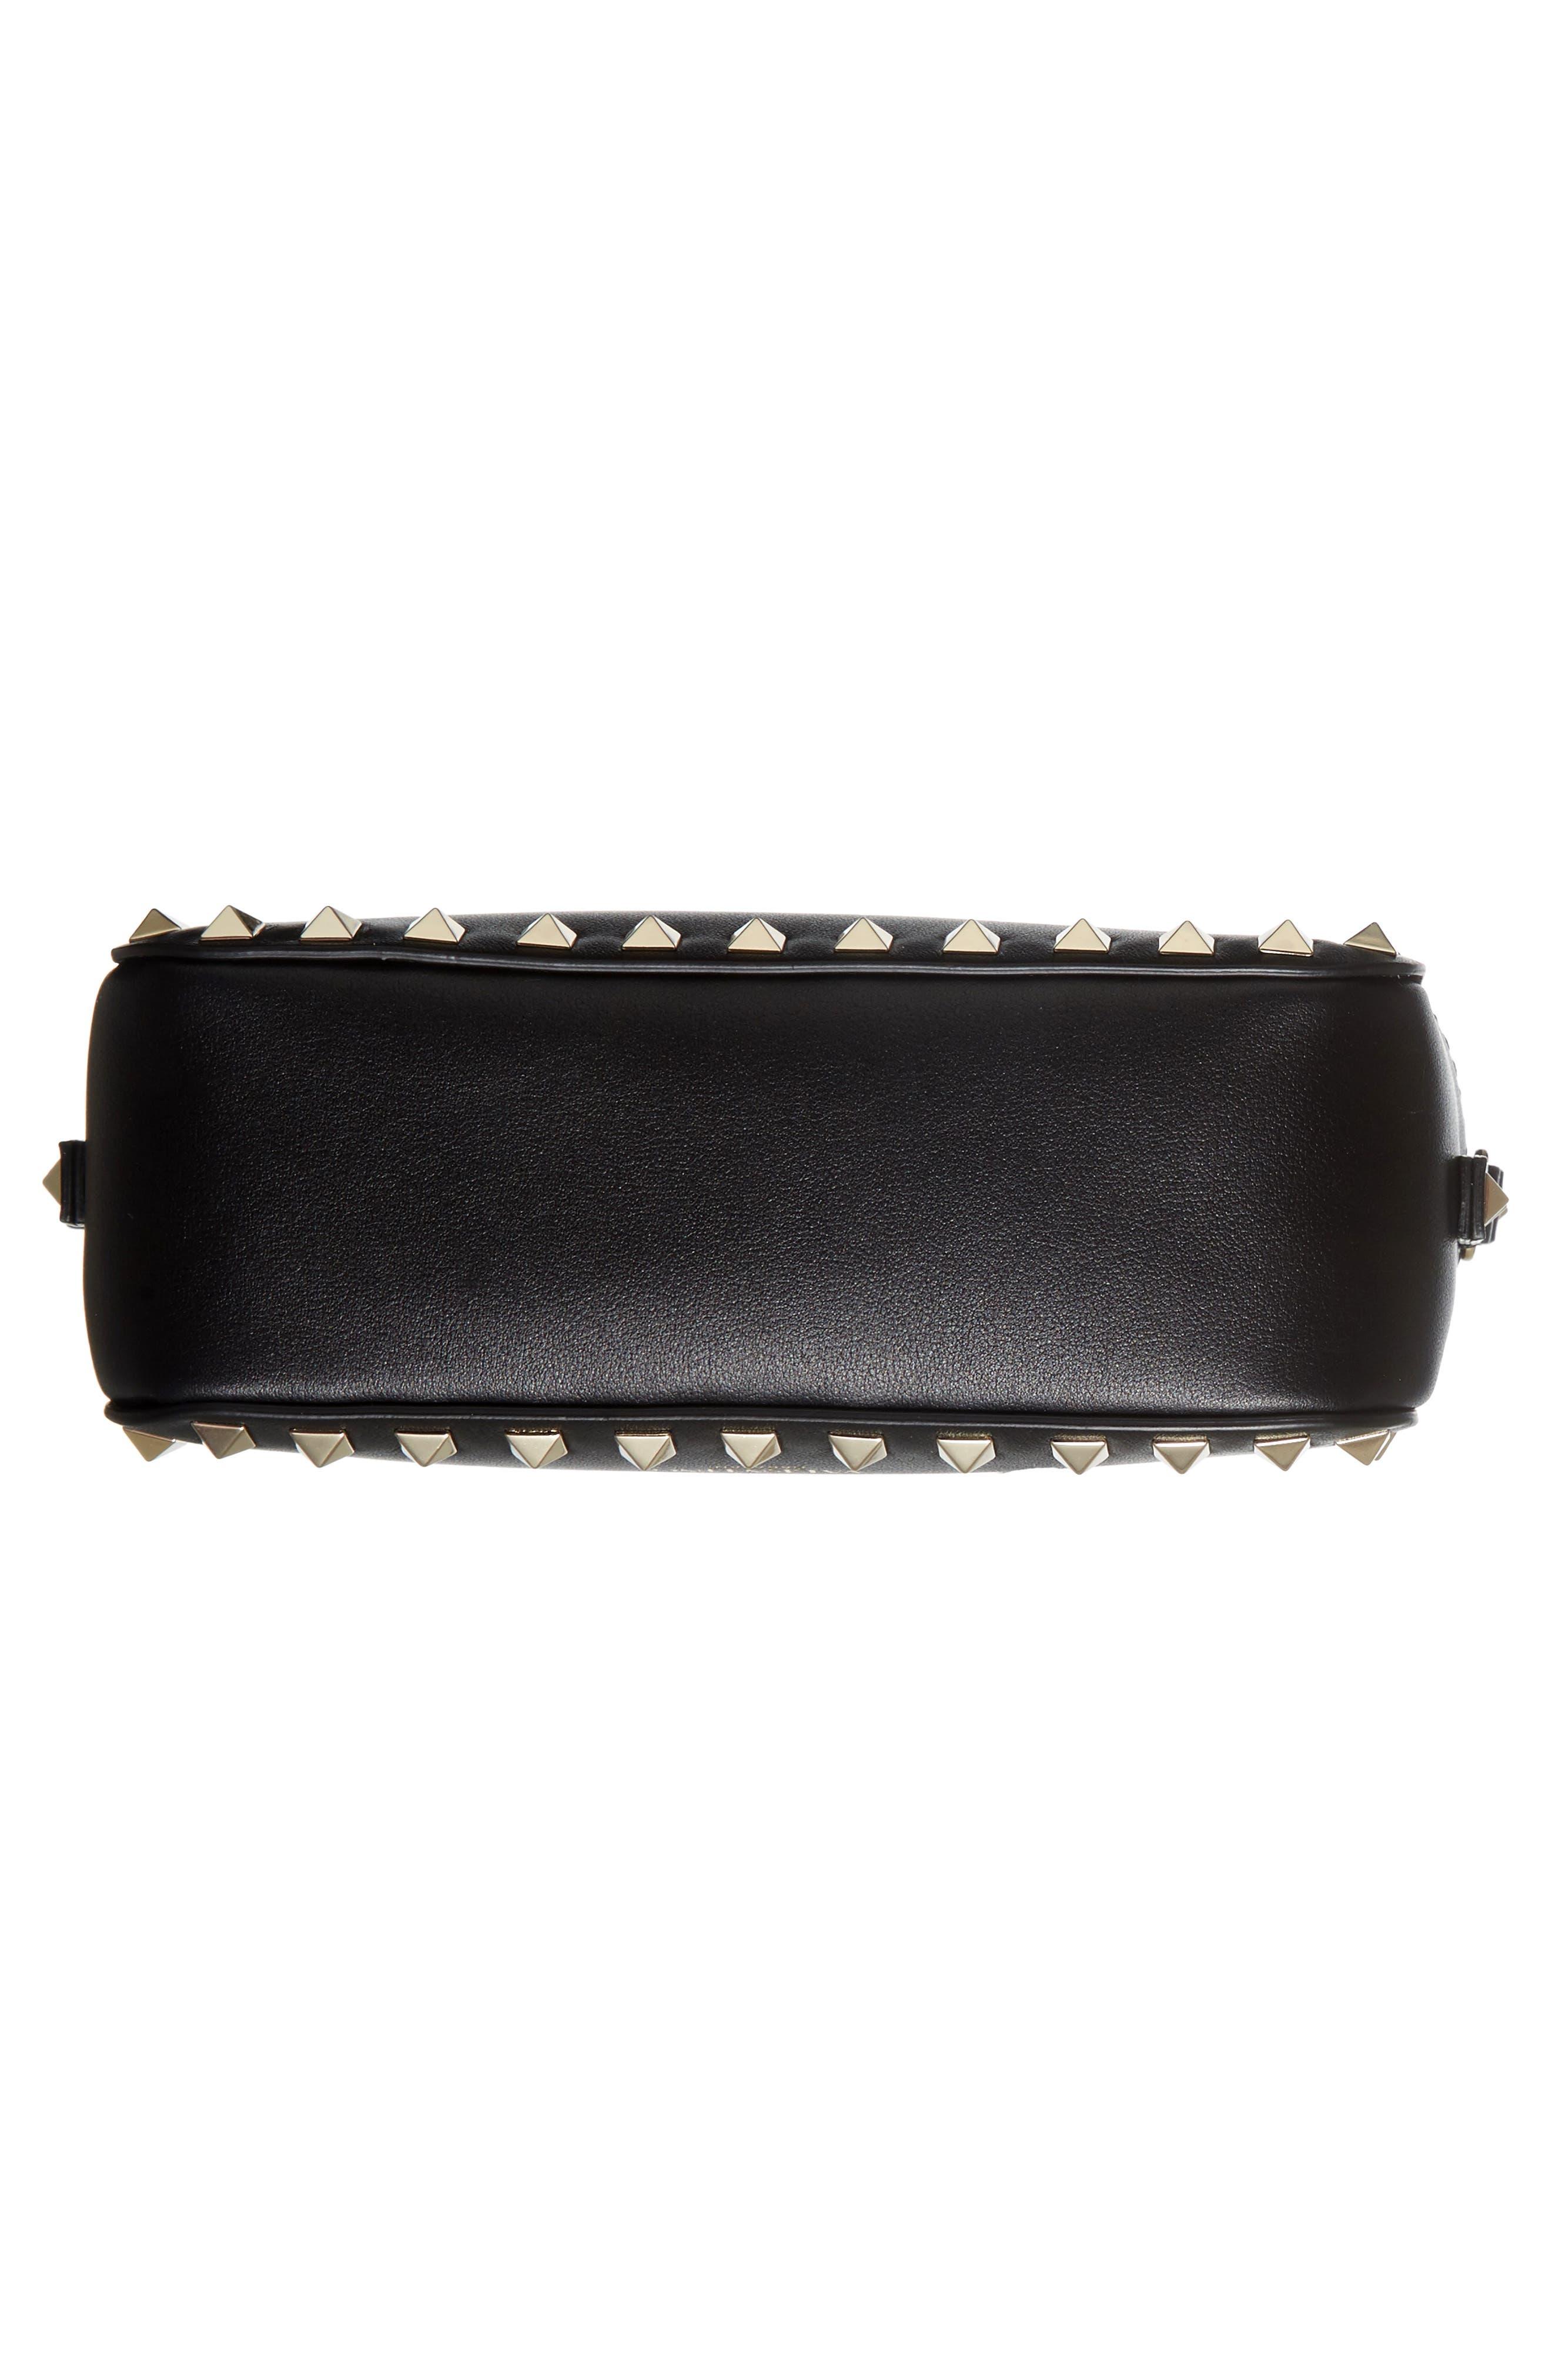 'Rockstud' Calfskin Leather Camera Crossbody Bag,                             Alternate thumbnail 5, color,                             NERO